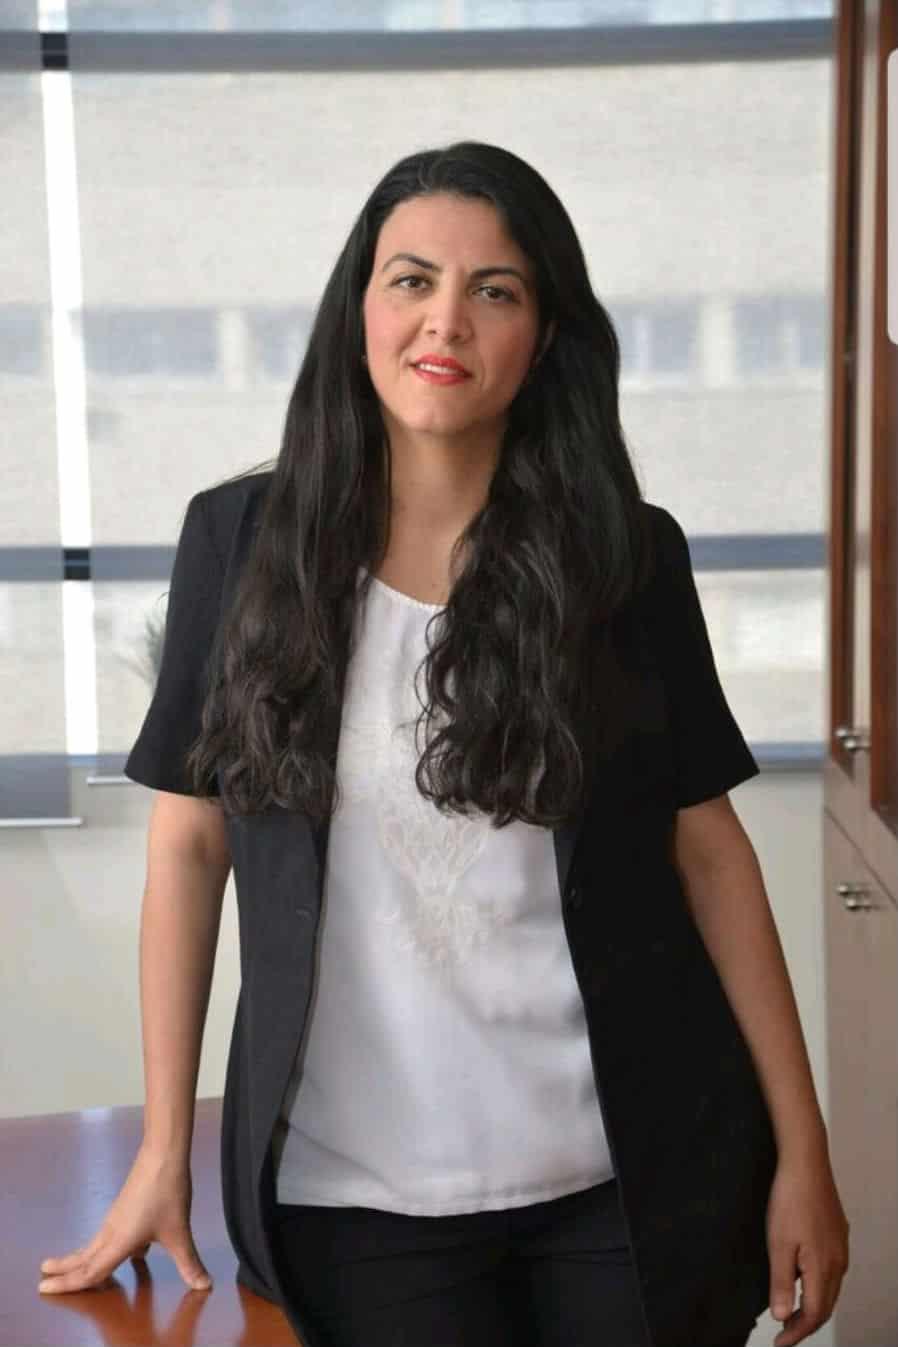 עורכת דין רחל דמרי-חדיד